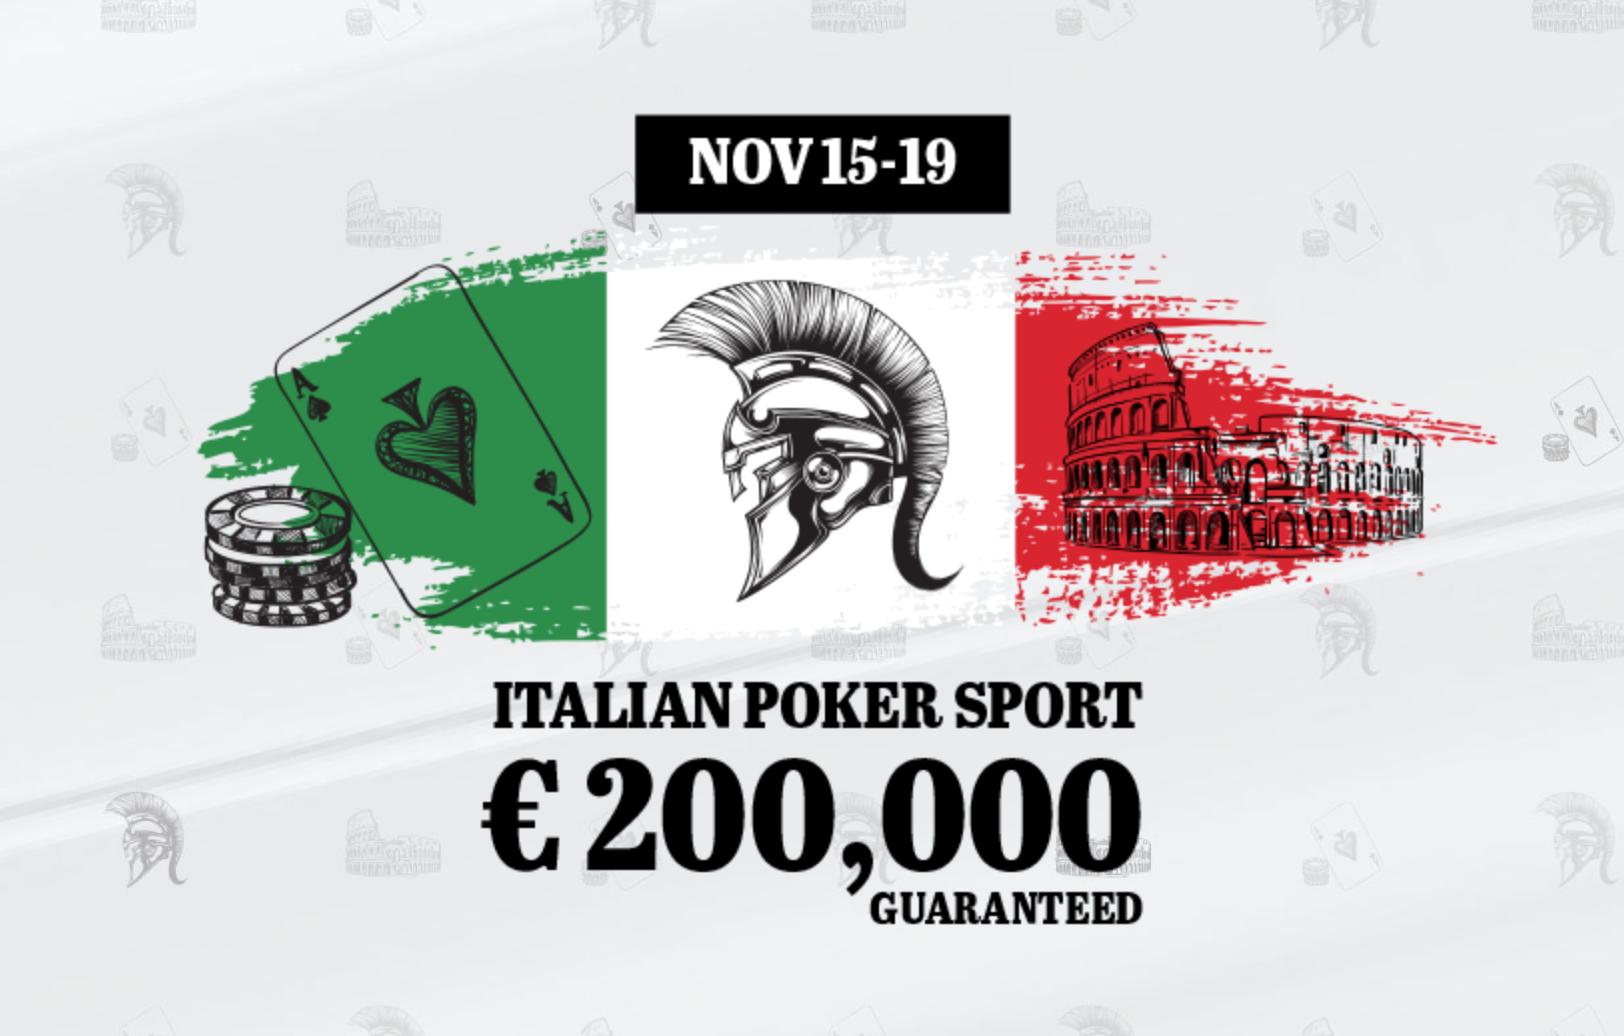 ItalianSportFestival